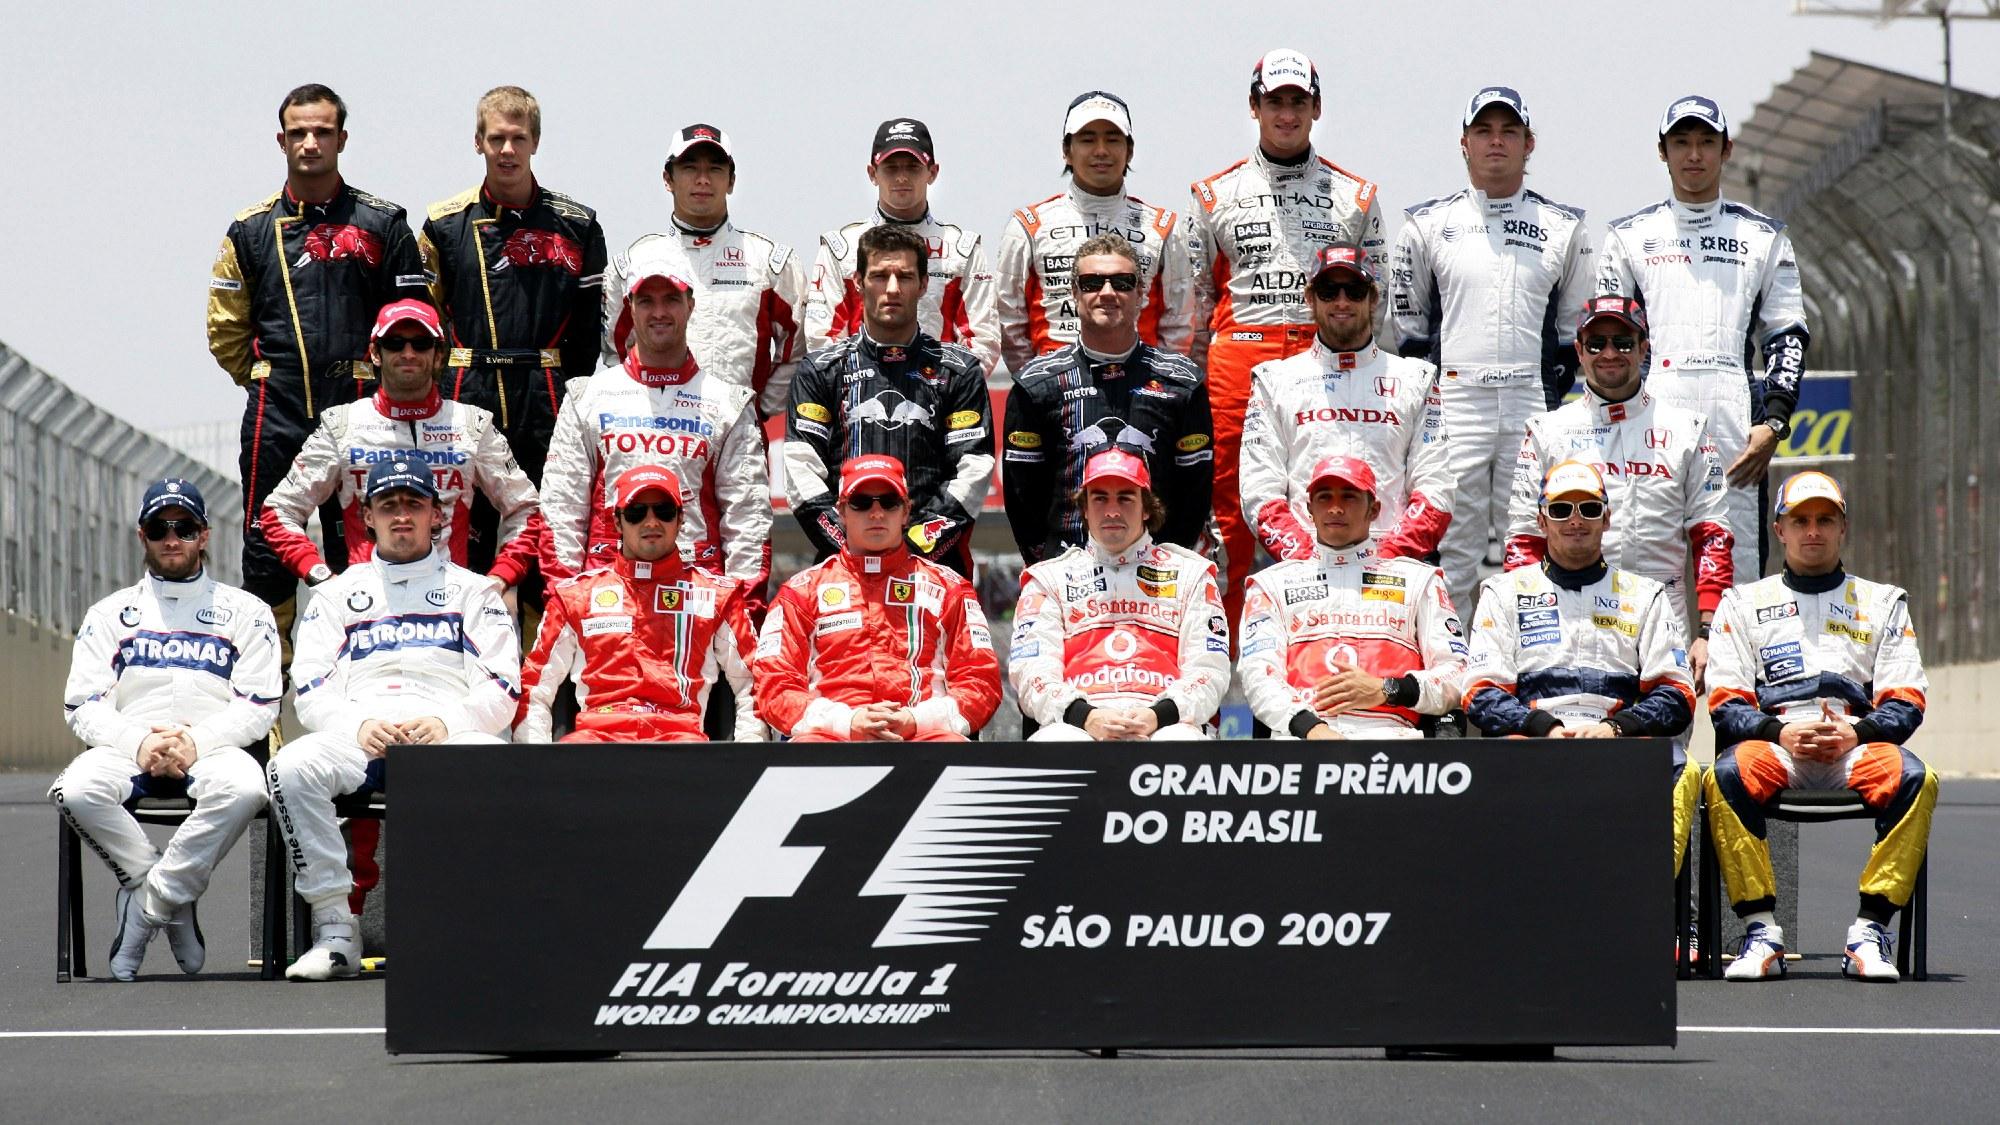 2007 Brazilian GP, driver photos